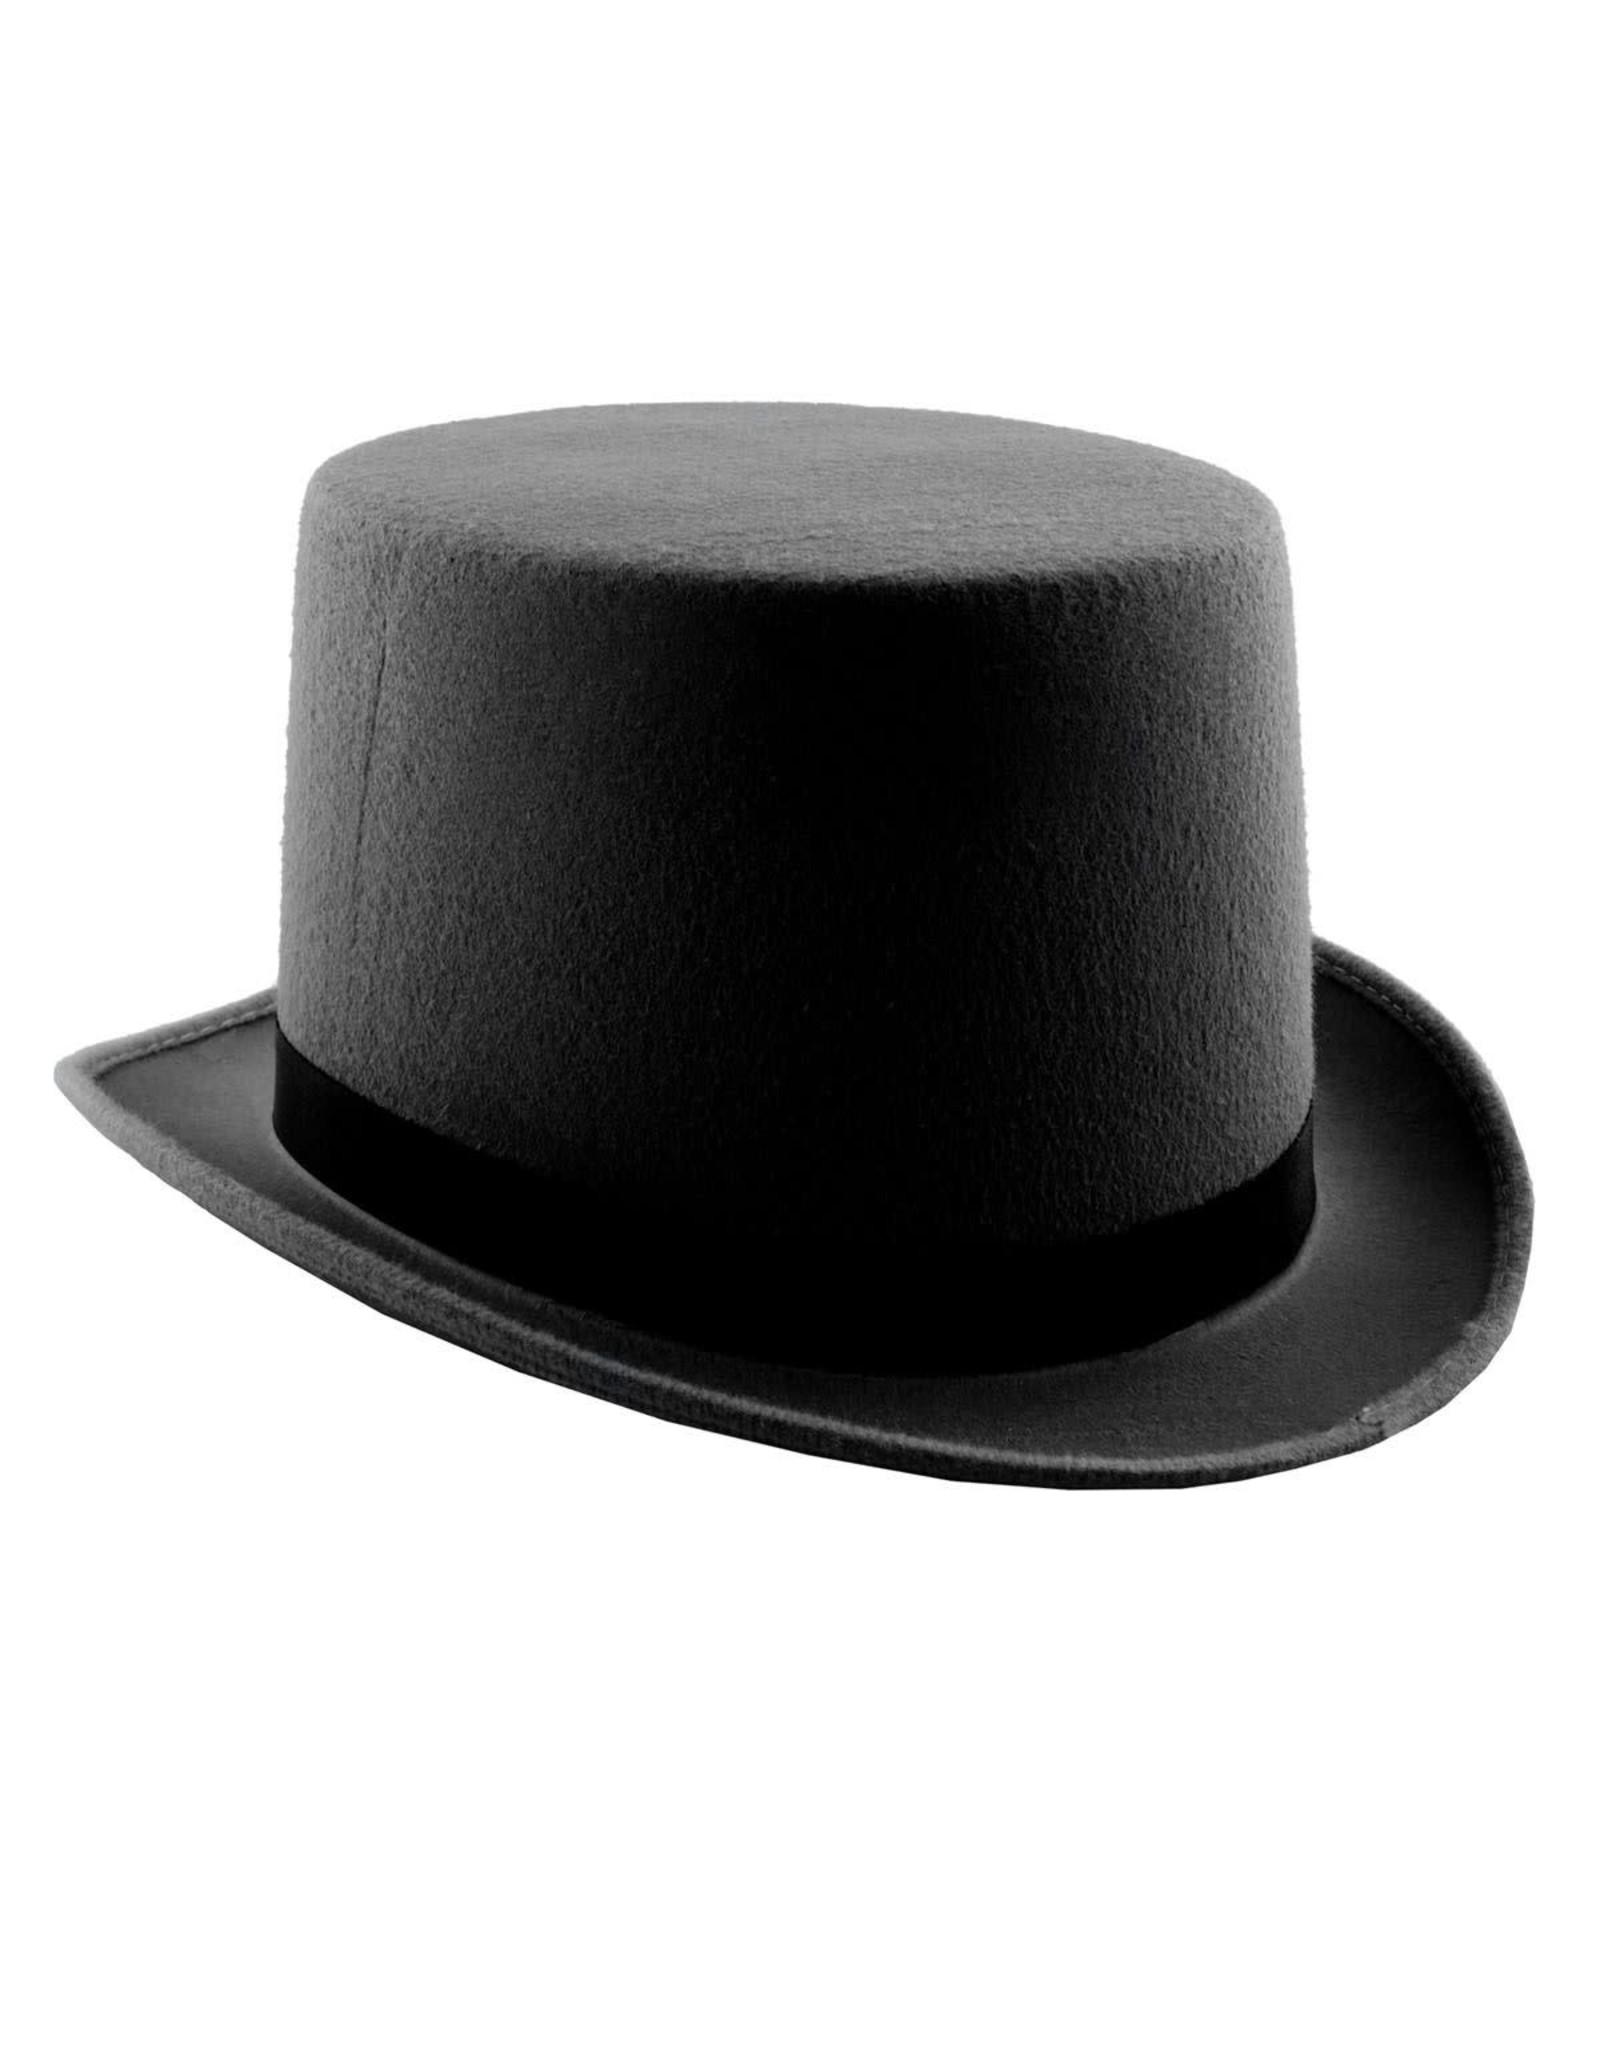 ESPA Hoge hoed zwart